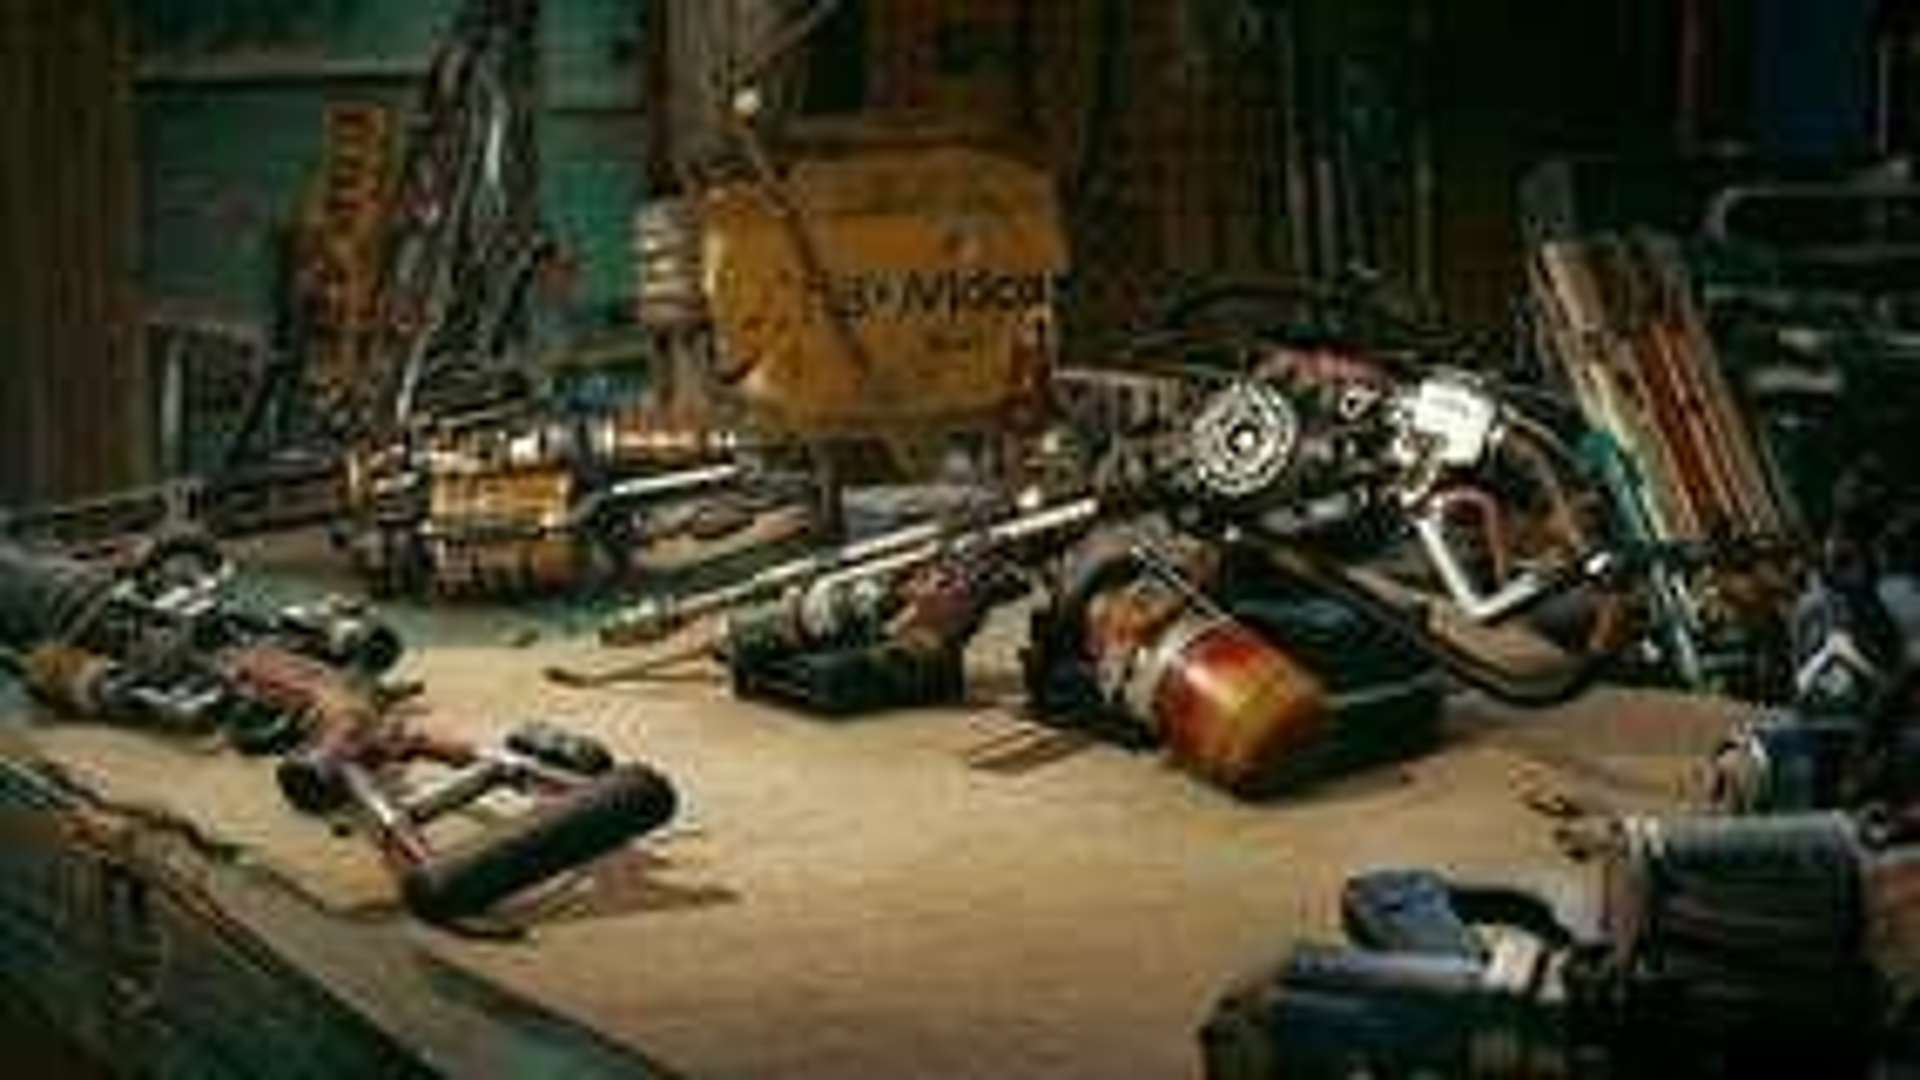 Image for Far Cry 6 rare materials - Where to find uranium, gunpowder, and durable plastic